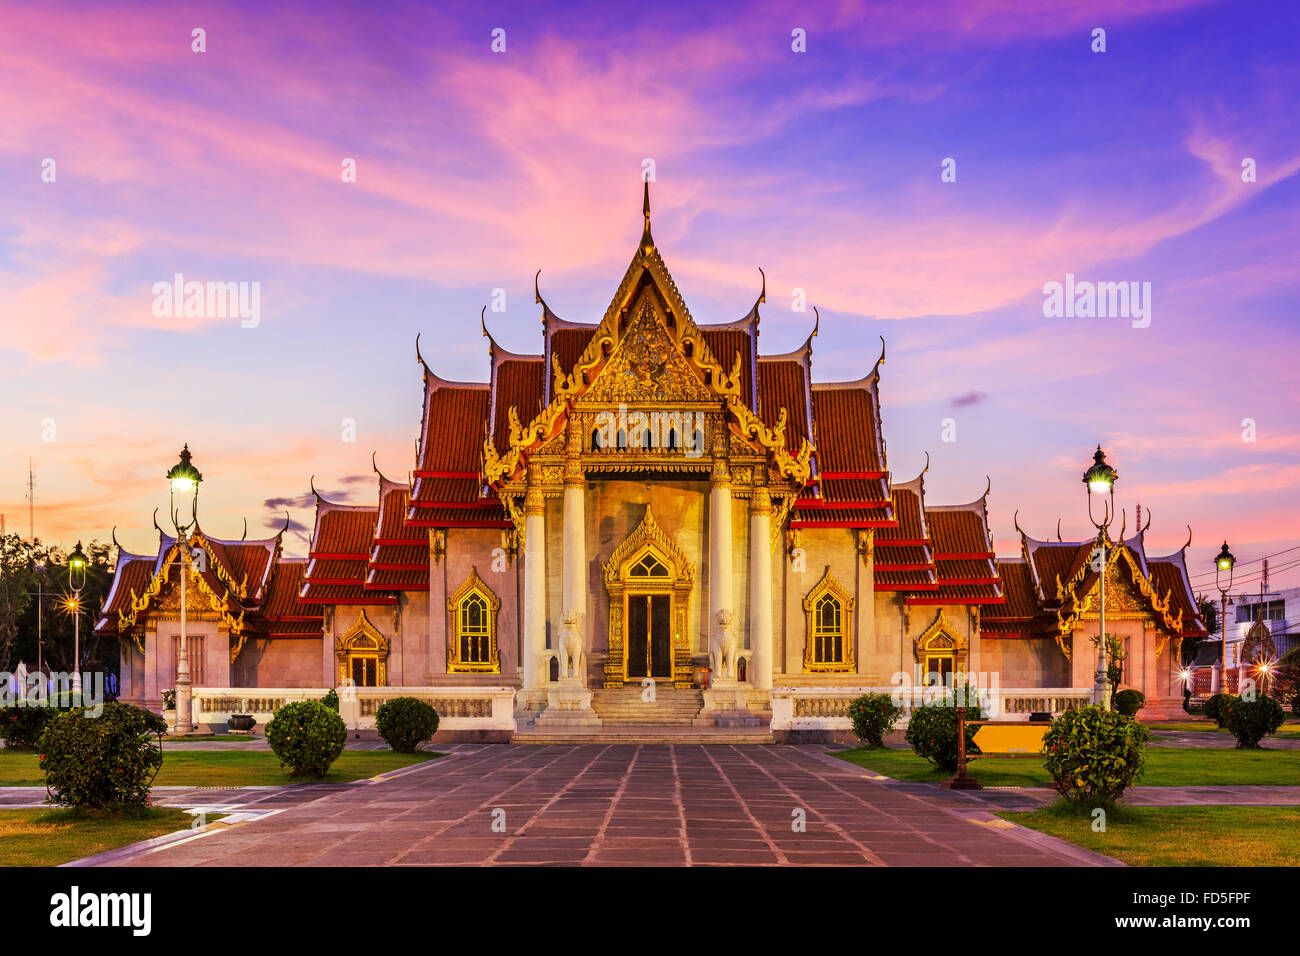 Bangkok, Tailandia. El Templo de mármol, Wat Benchamabopit Dusitvanaram al atardecer. Foto de stock